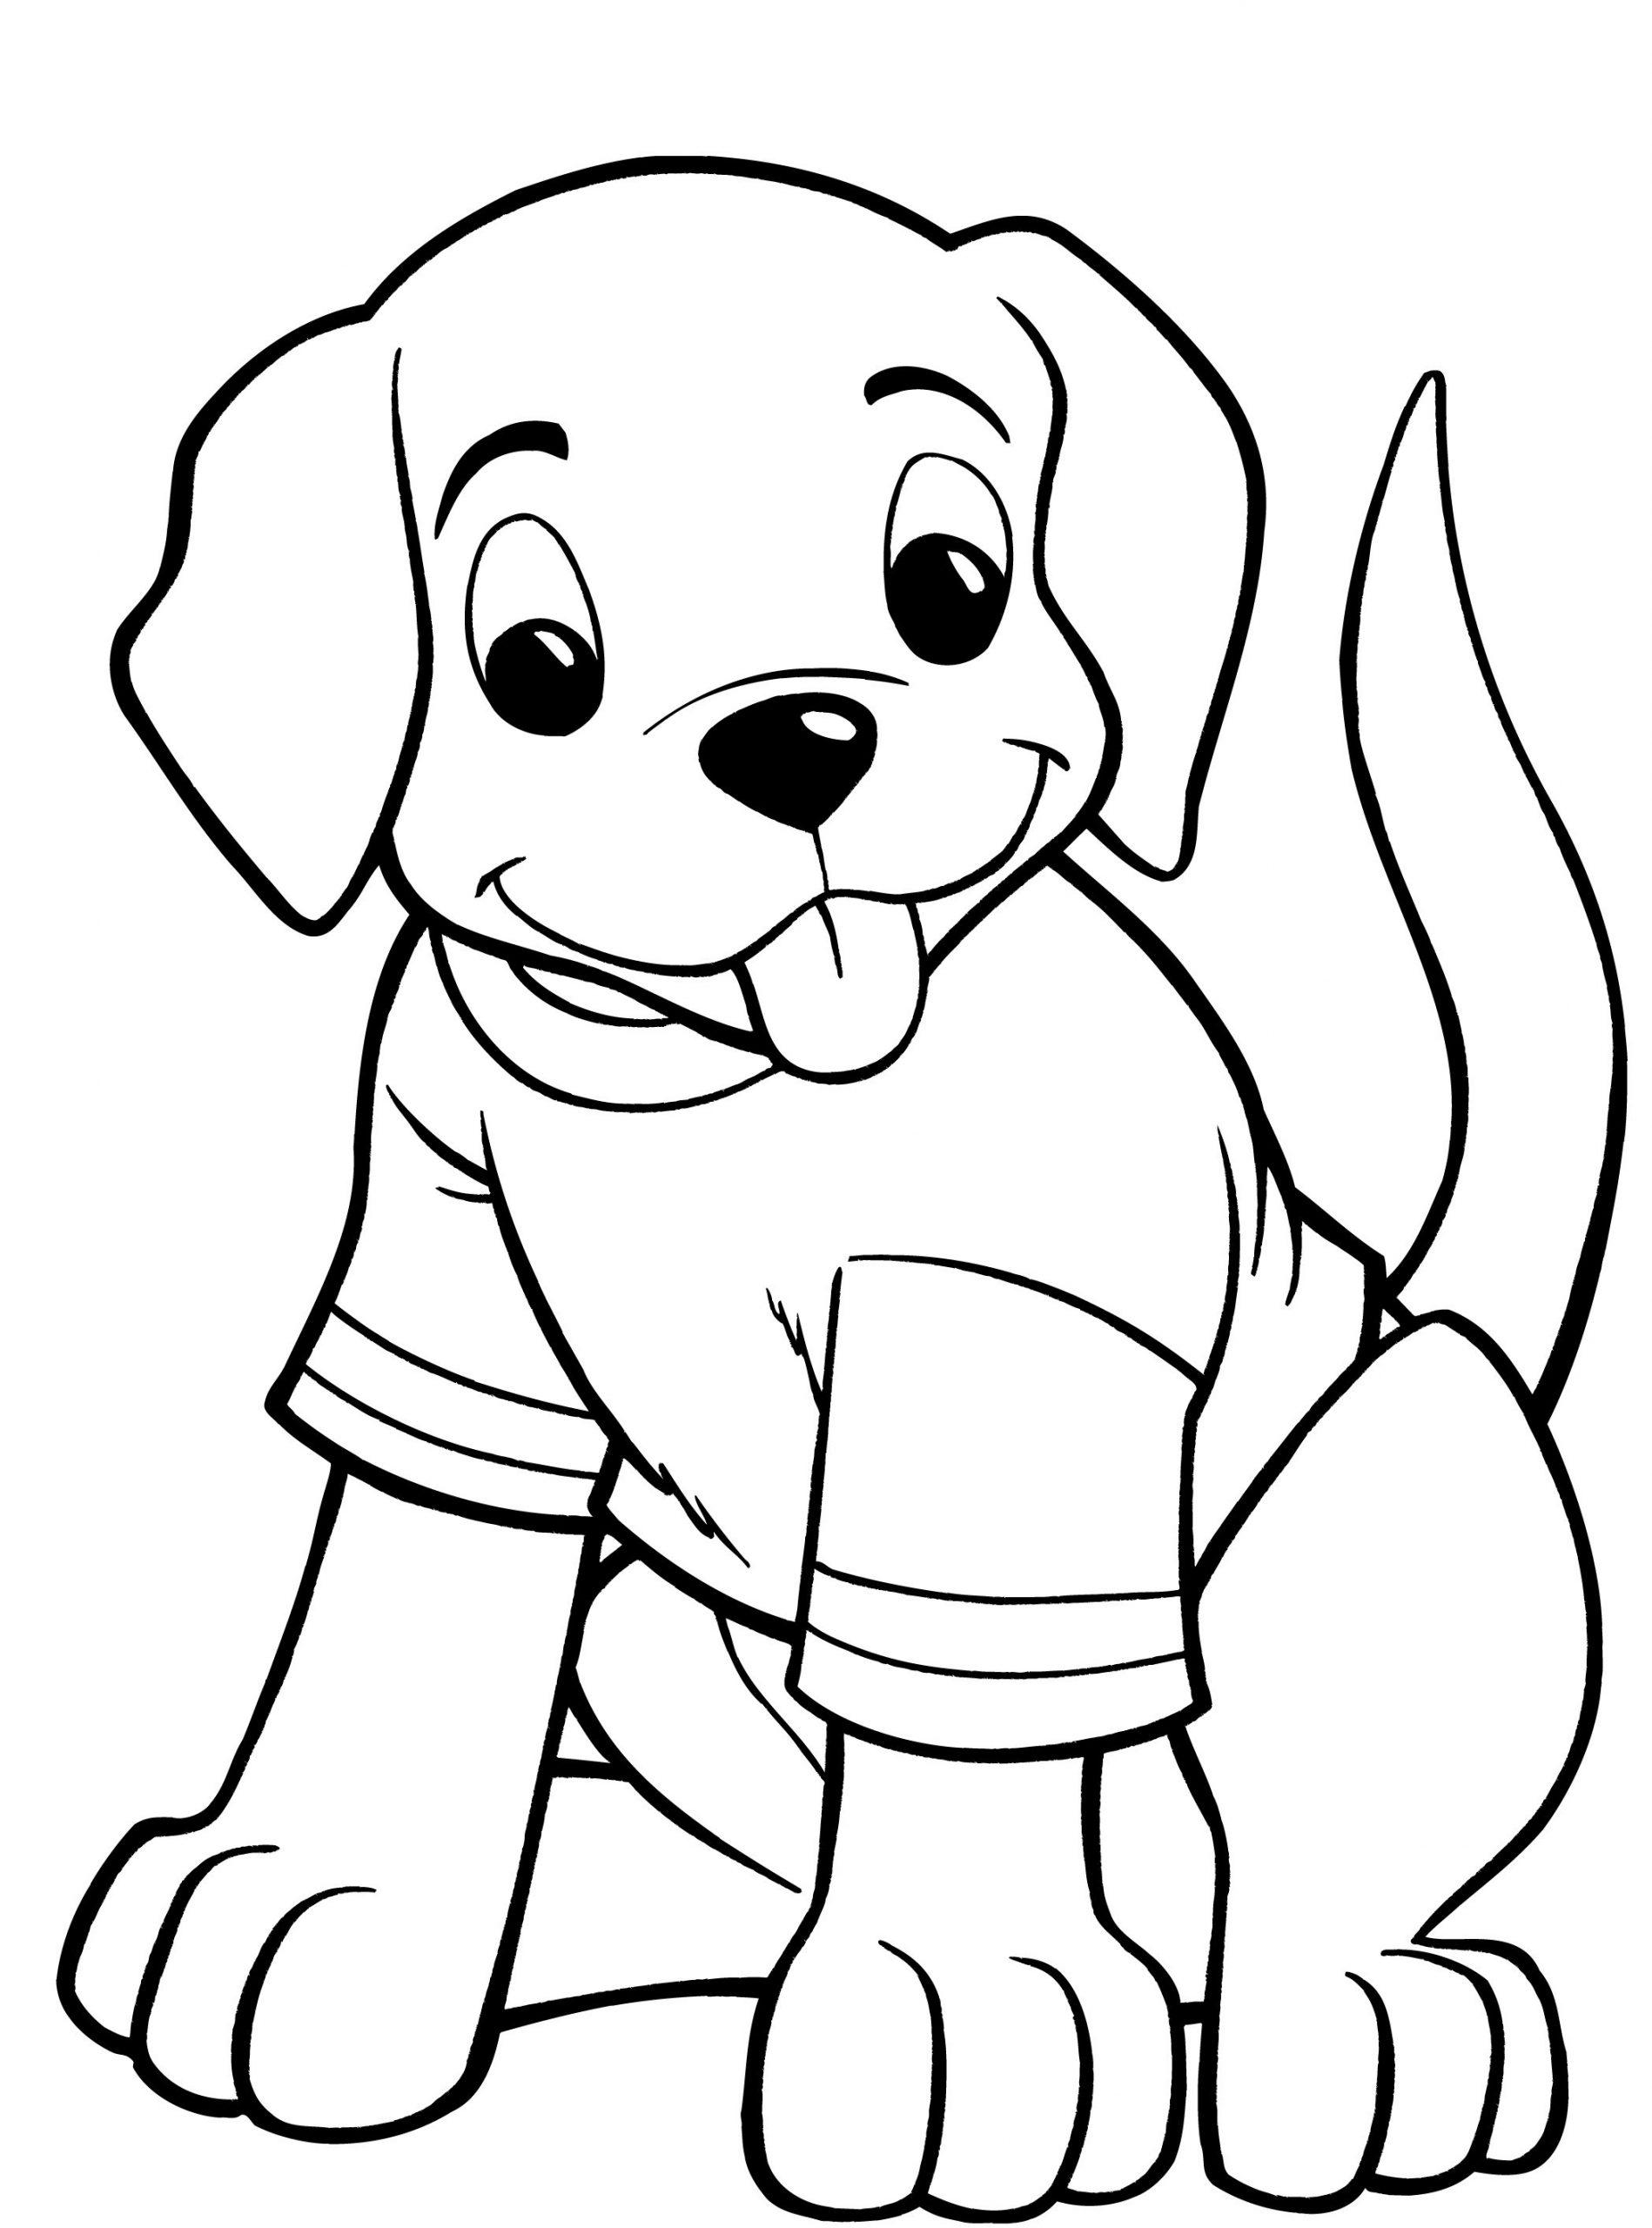 Раскраска собака носить рубашку